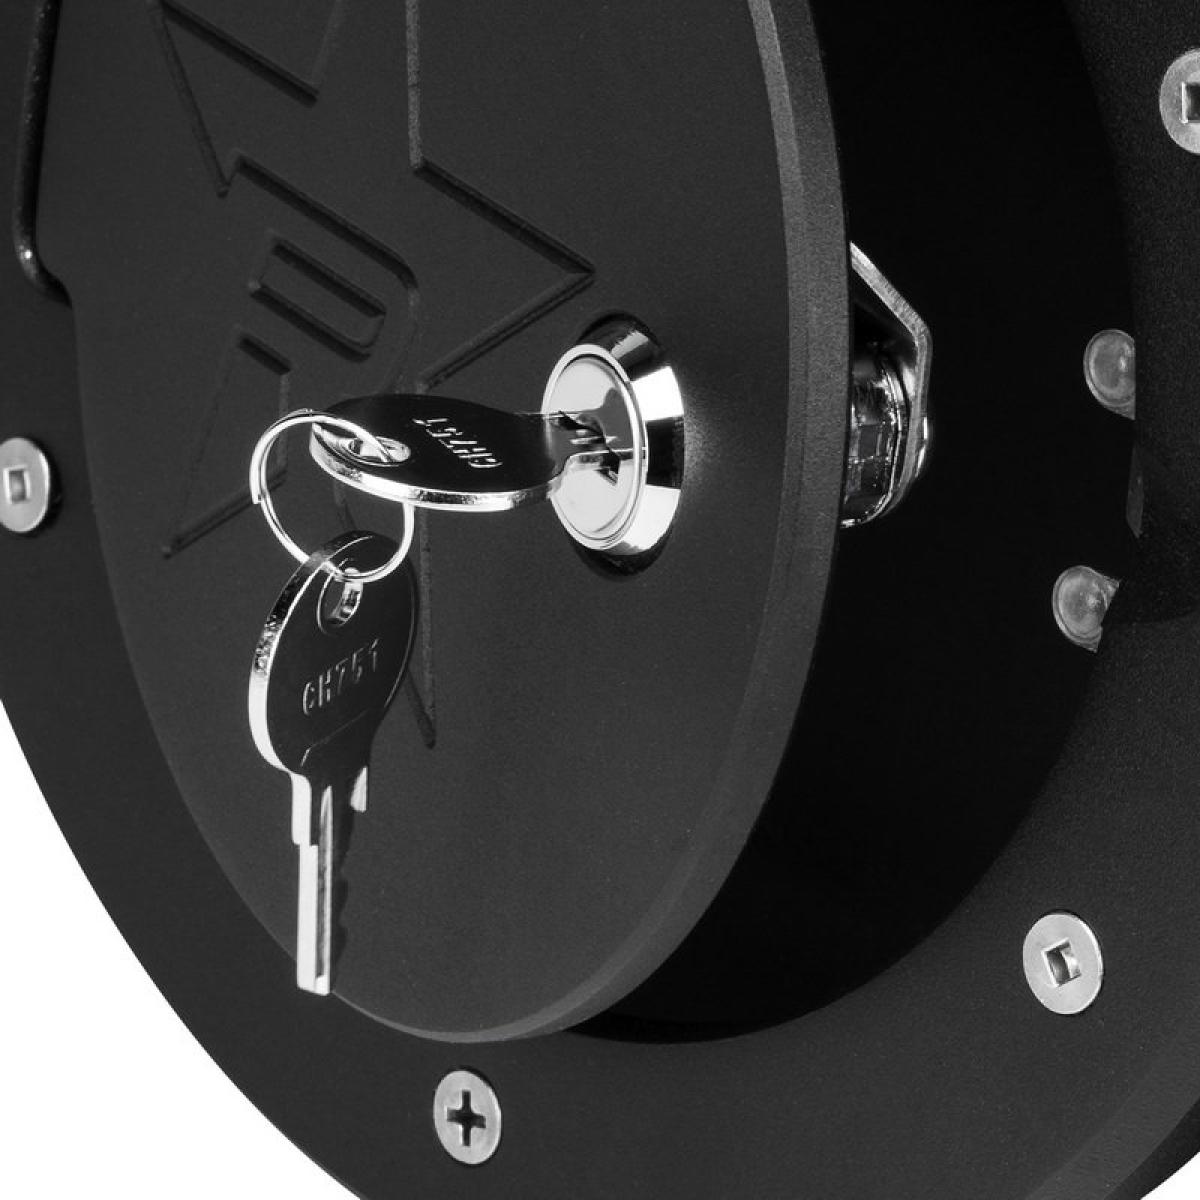 schwarz ABS Tankdeckeldeckel Passend f/ür Wrangler JK 2007-2017 Autozubeh/ör Tankdeckel